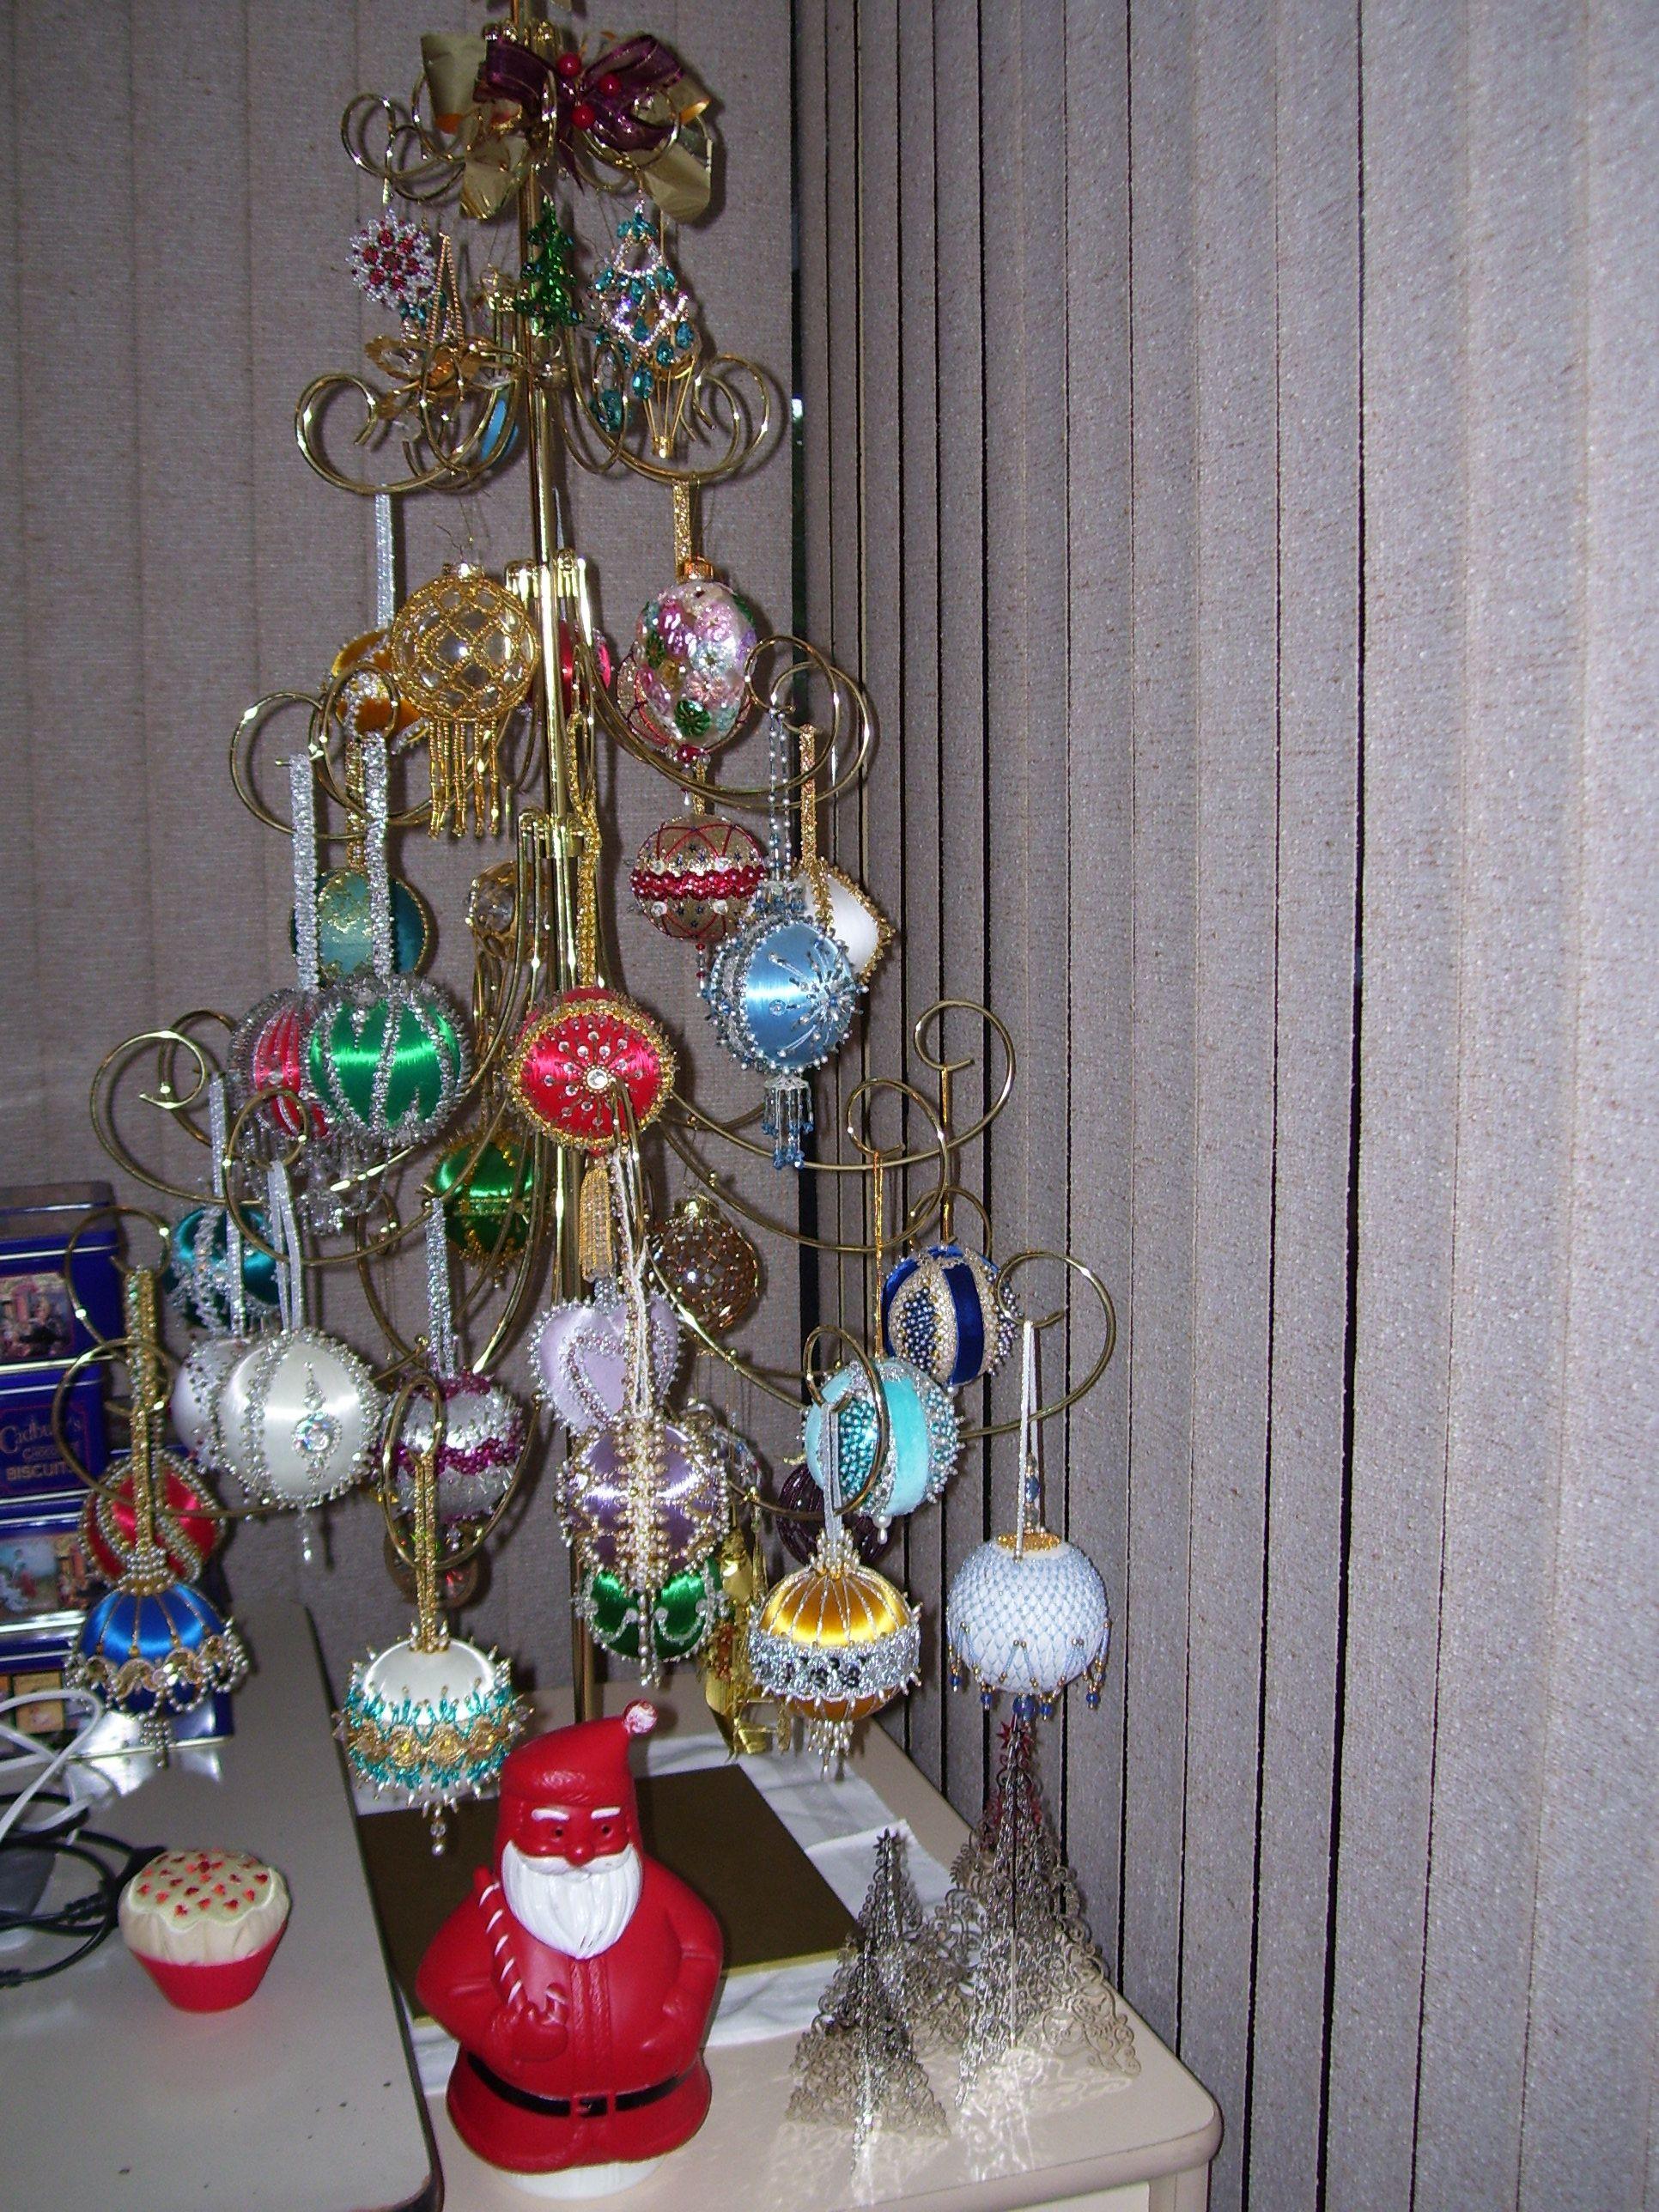 Handmade Beaded Ornaments on Brass Tree - 2012